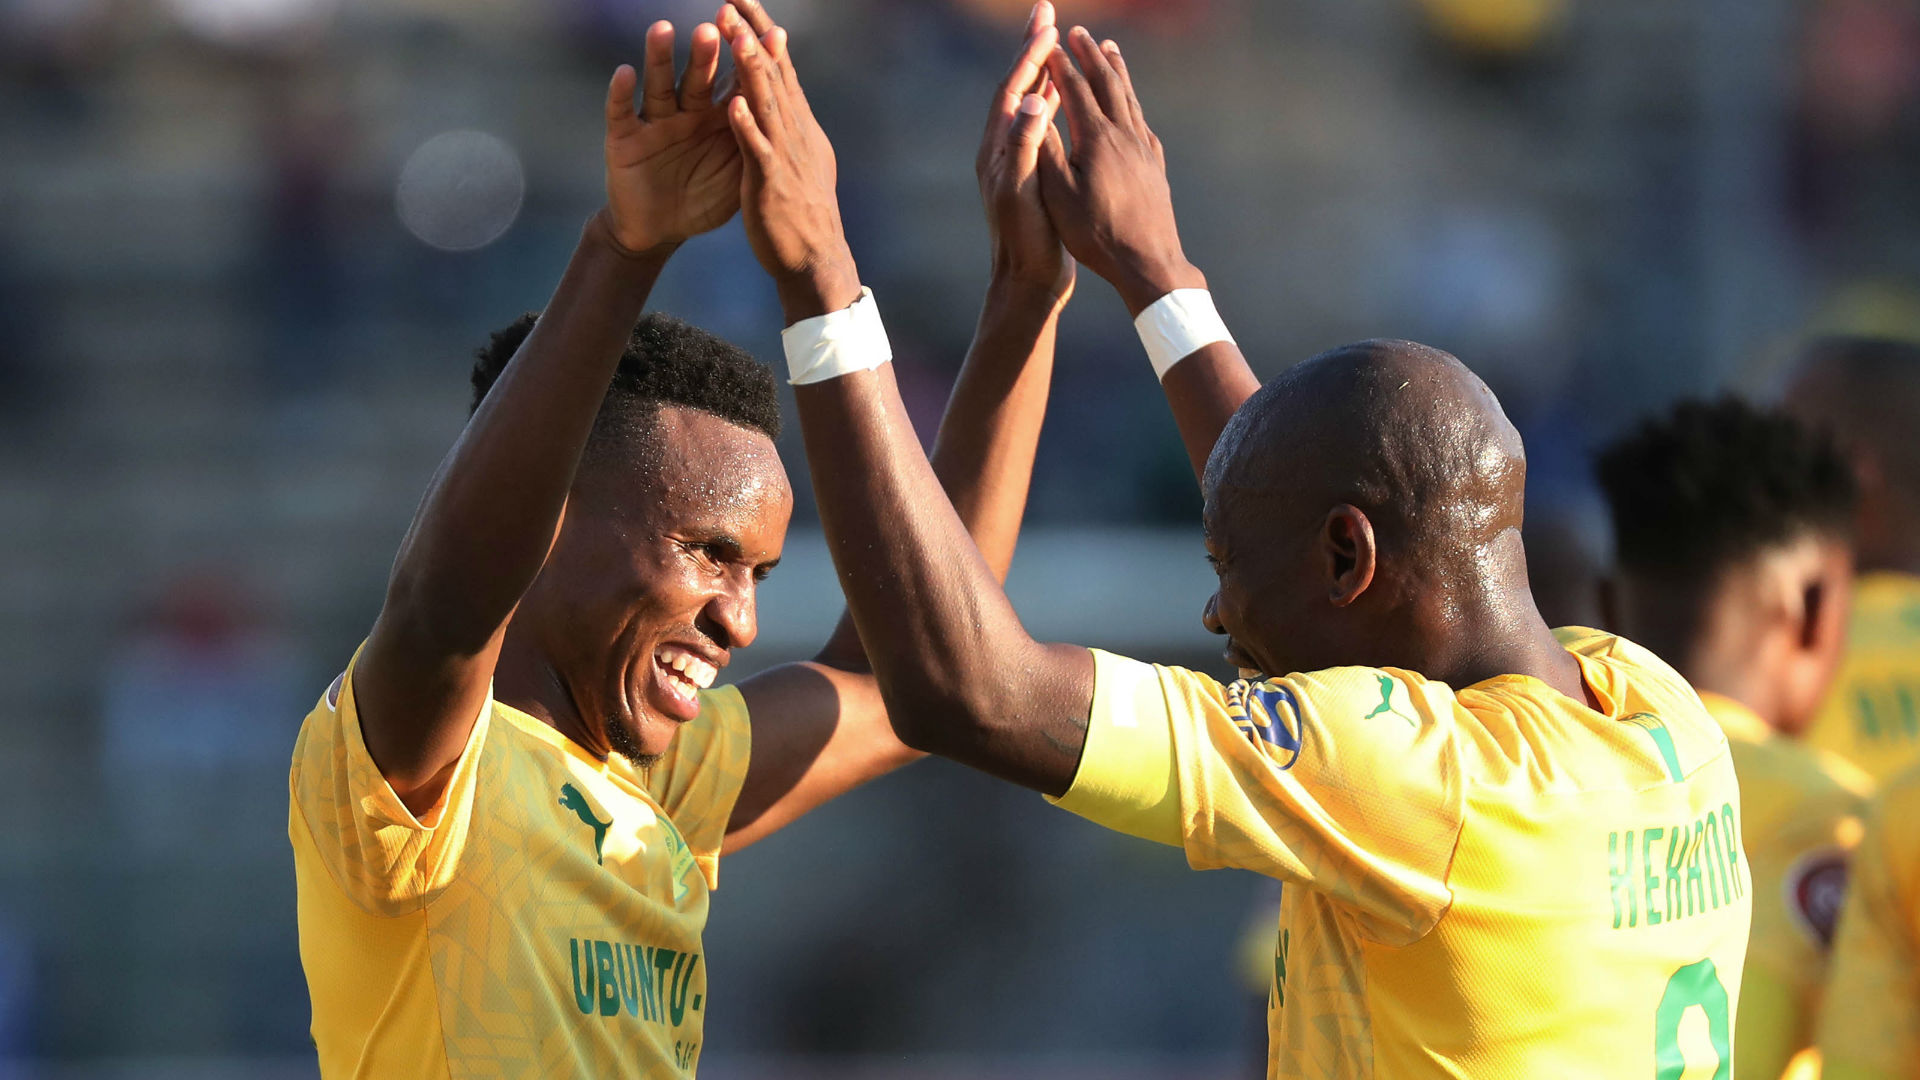 Mamelodi Sundowns star Zwane scoops Safja Footballer of the season award